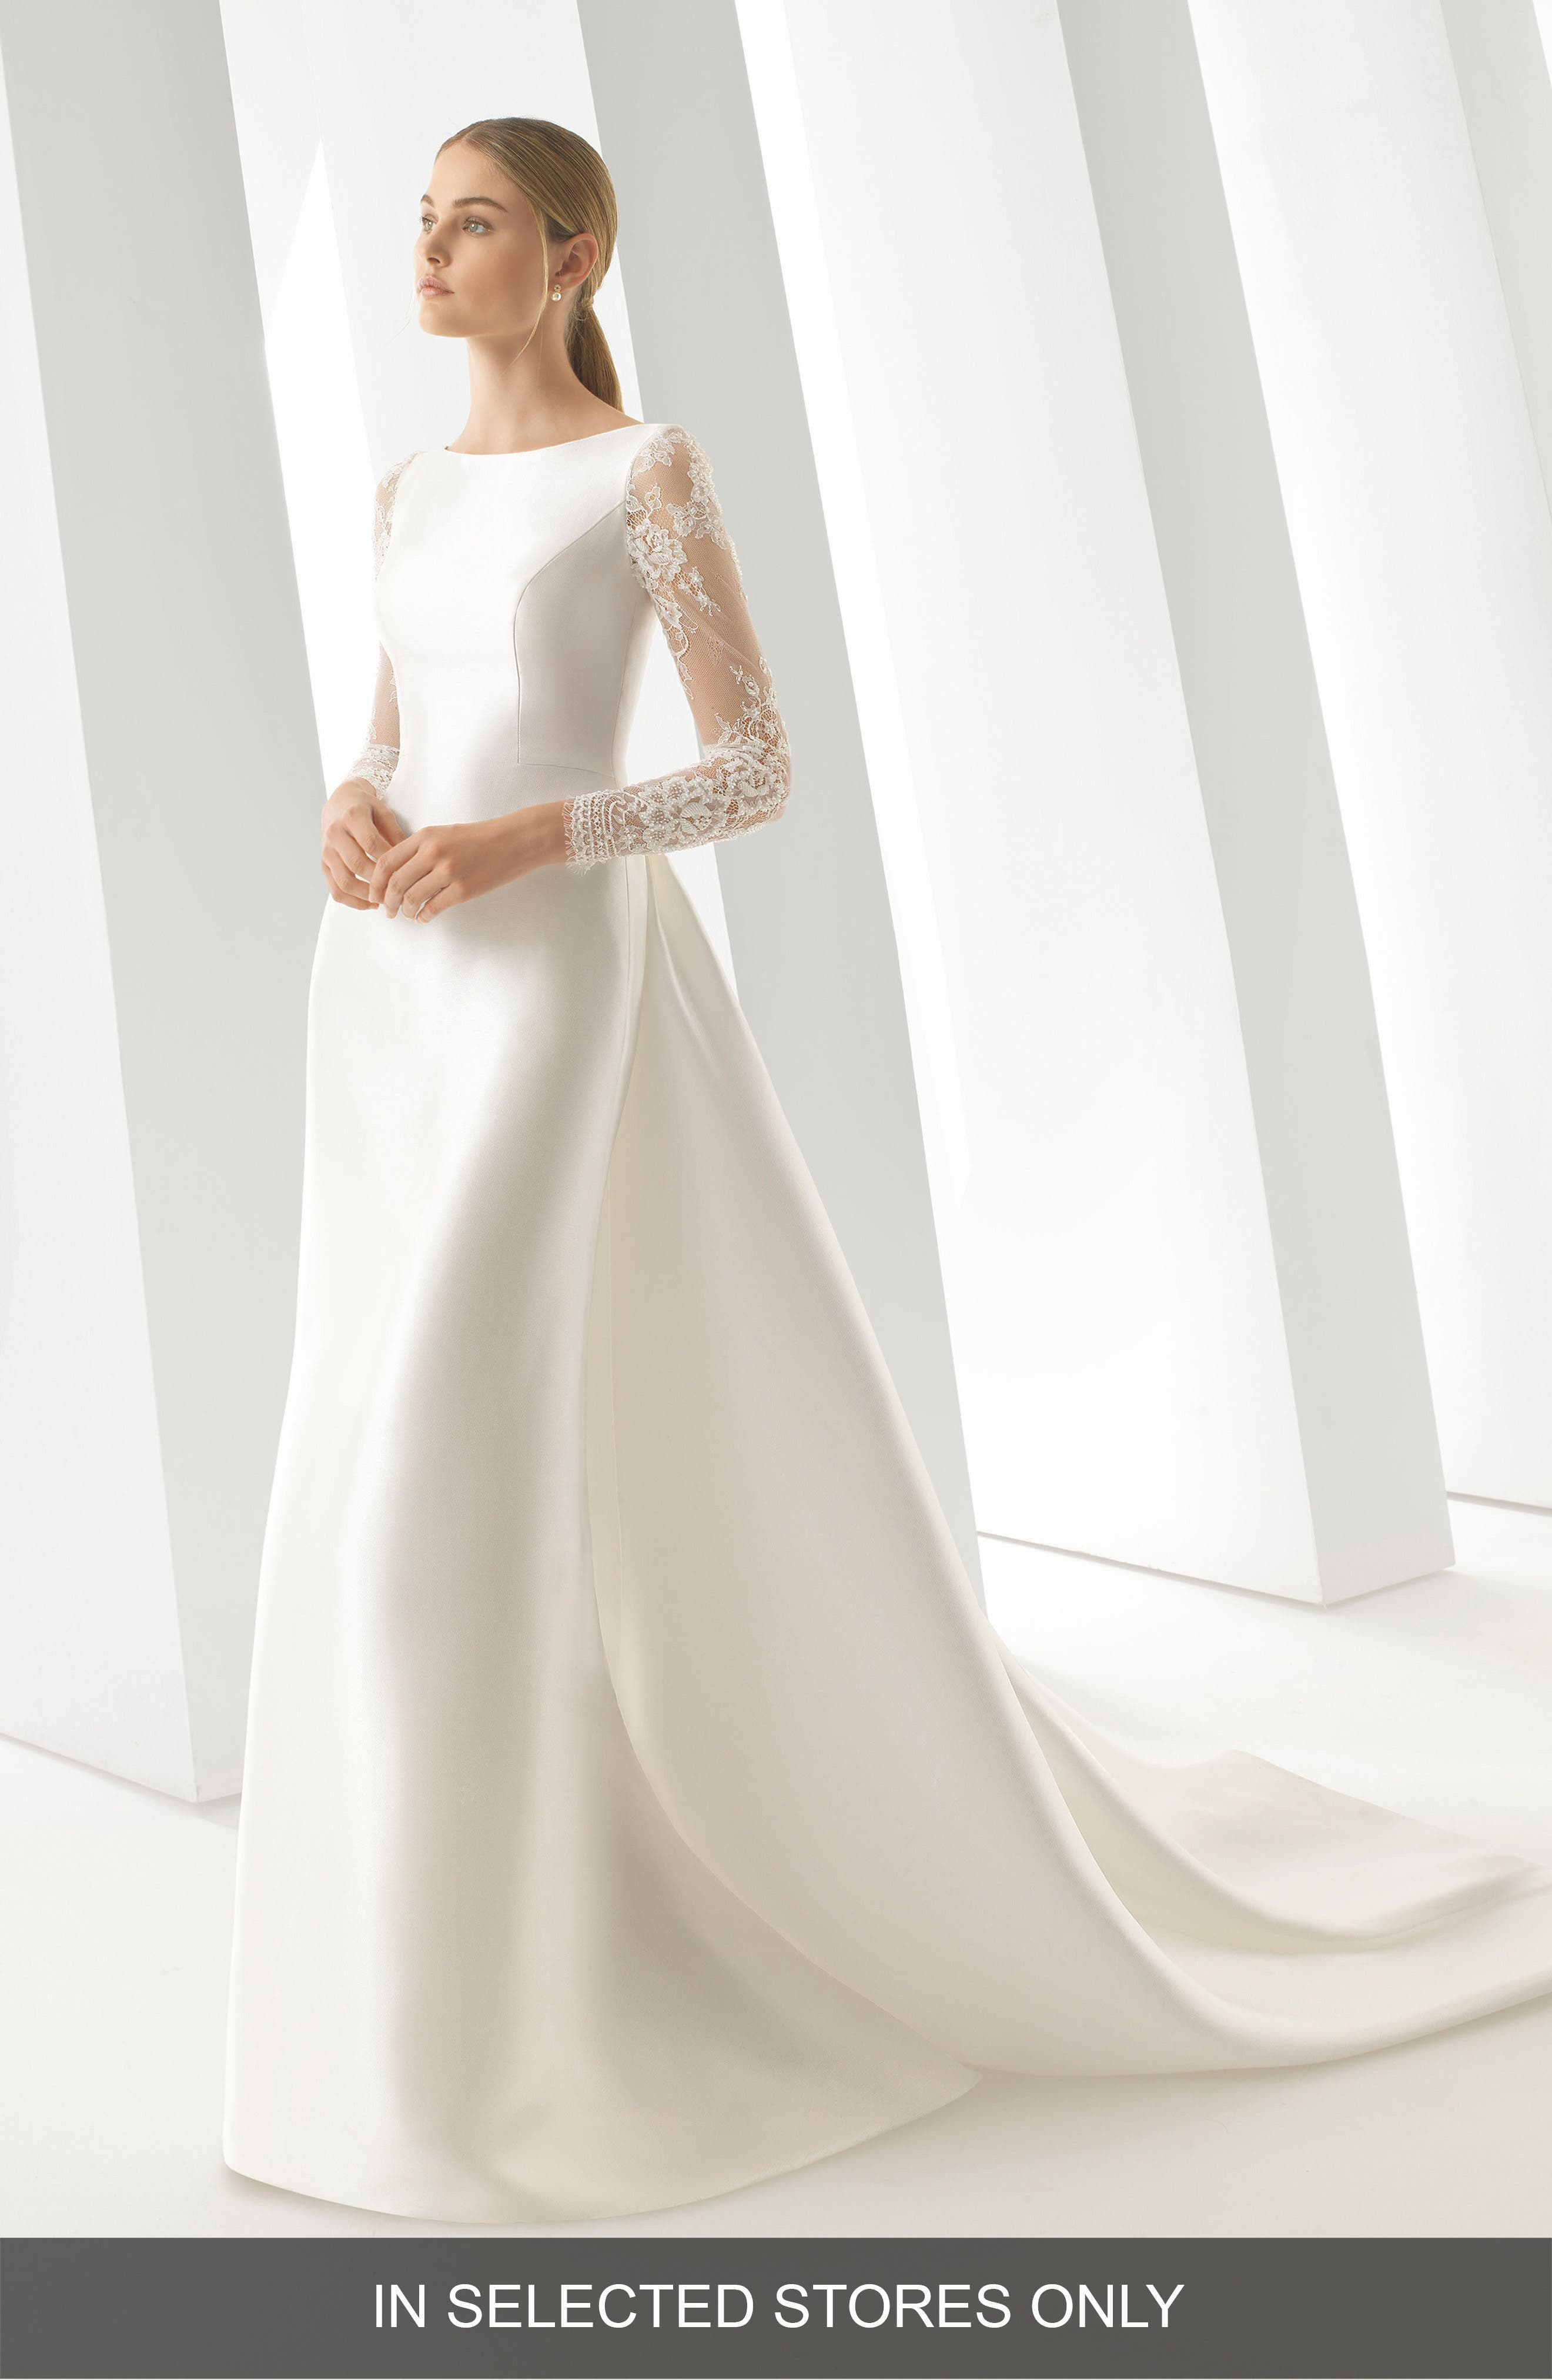 Doreen Column Gown with Detachable Train,                             Main thumbnail 1, color,                             NATURAL